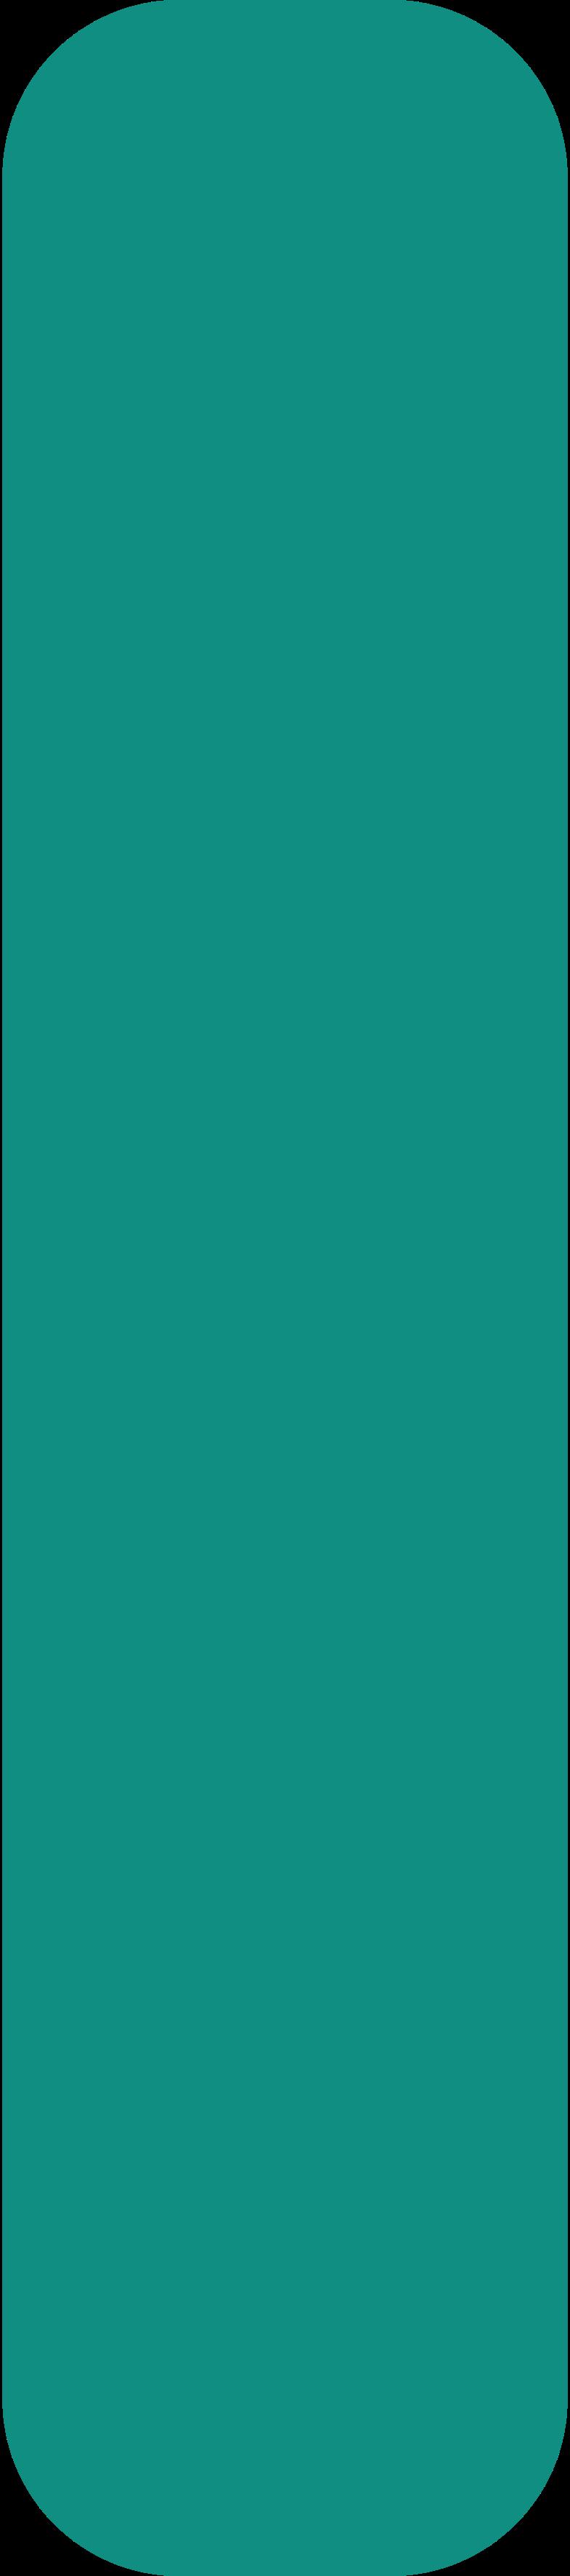 shape green Clipart illustration in PNG, SVG